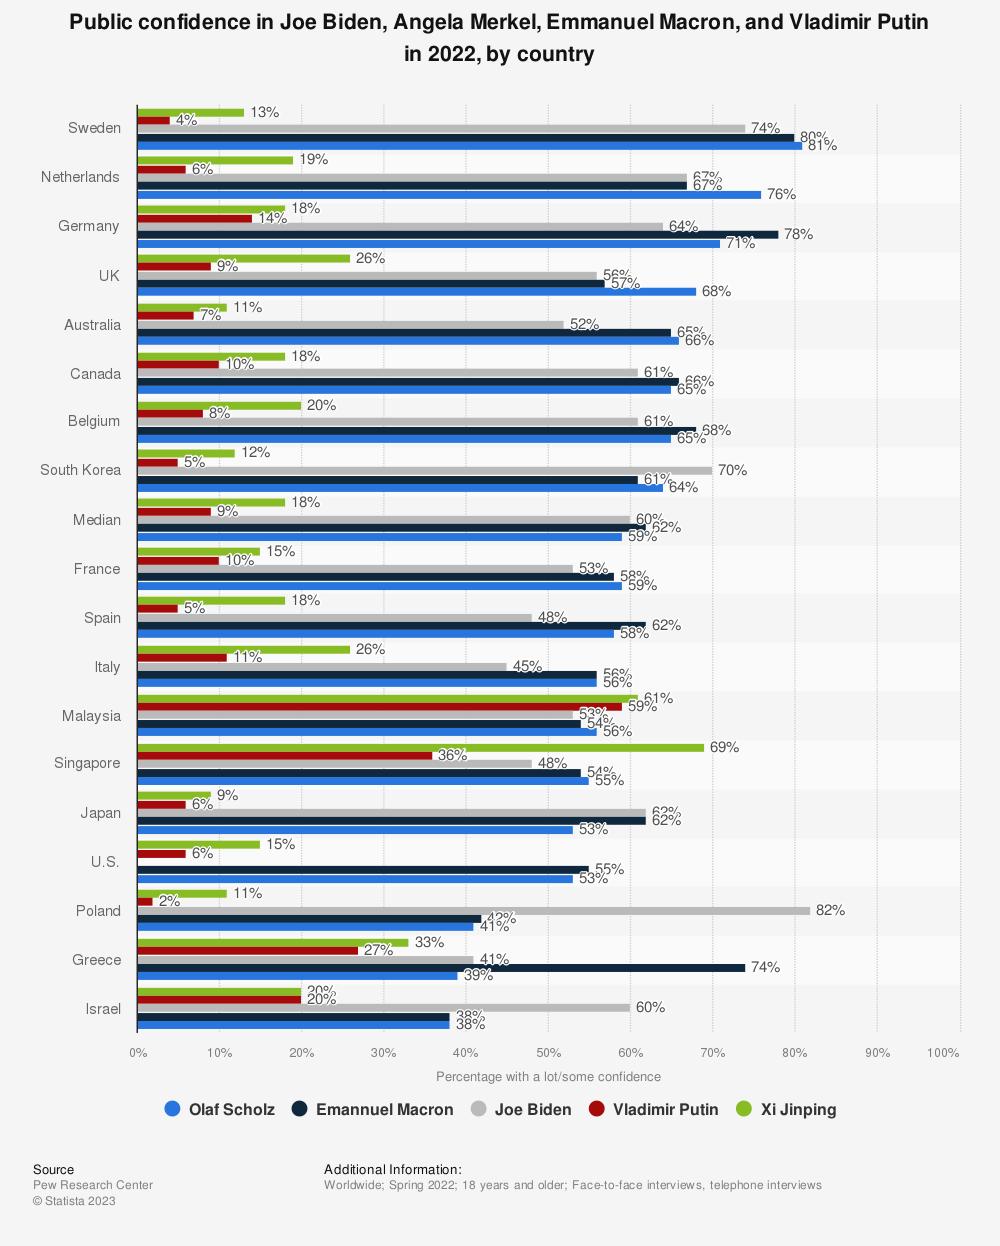 Statistic: Public confidence in Barack Obama, Angela Merkel, Ban Ki-moon and Vladimir Putin, by country in 2012 | Statista